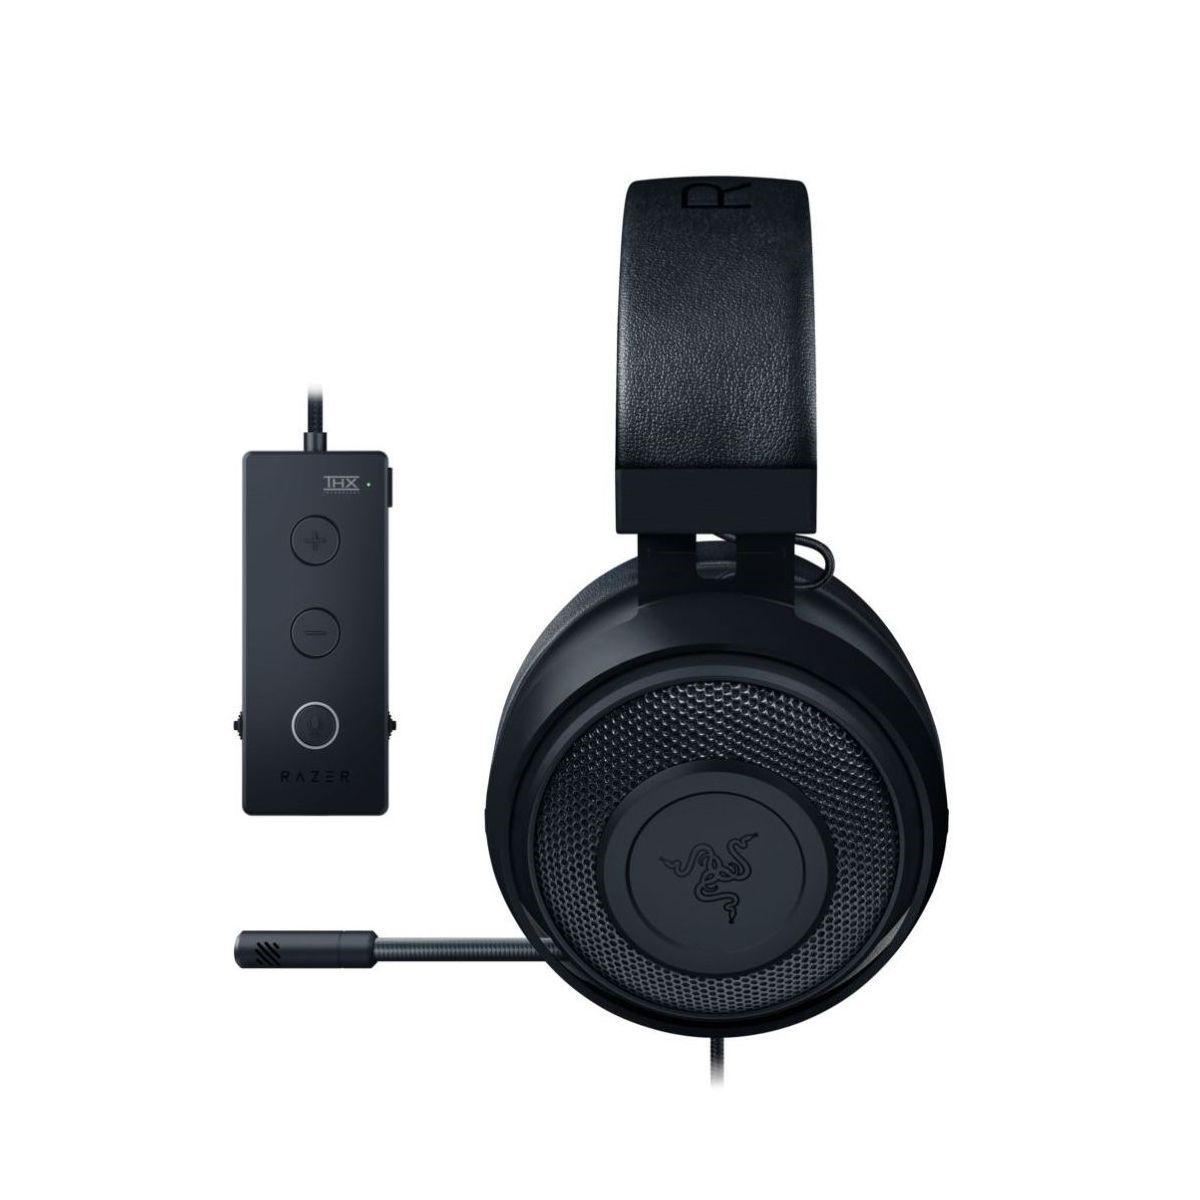 Razer Kraken Tournament Edition Gaming Headset Black